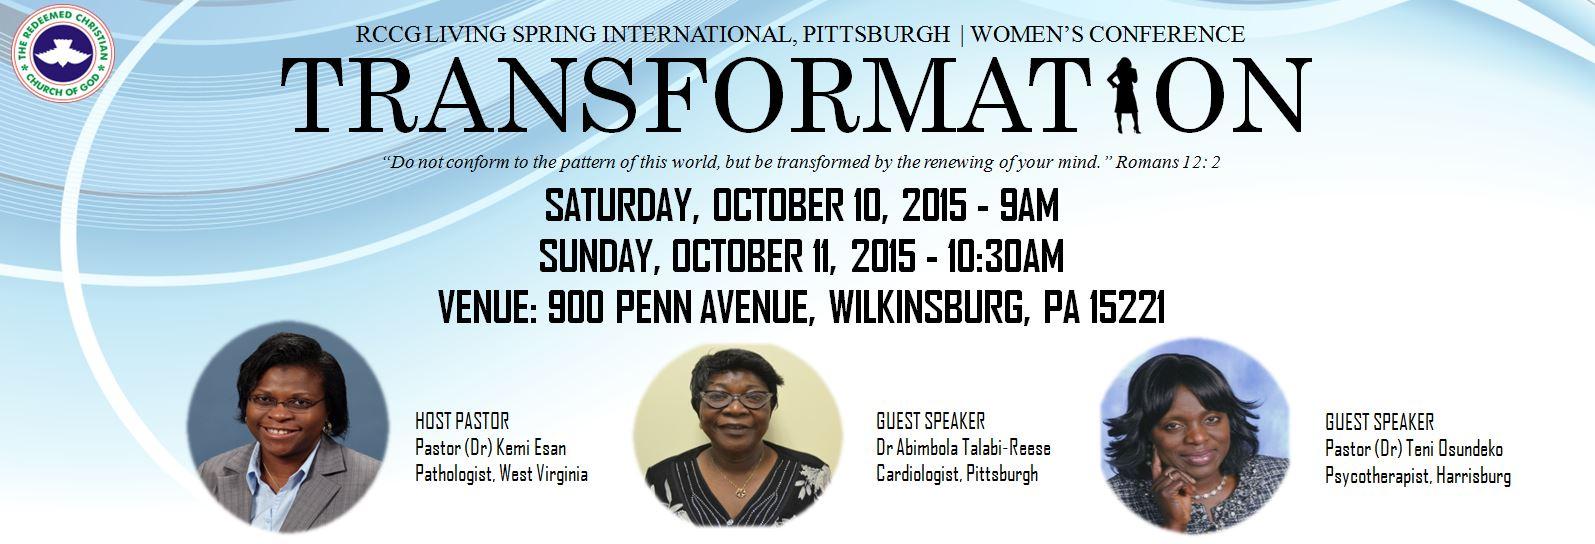 Women's Conference Flyer 4 Website